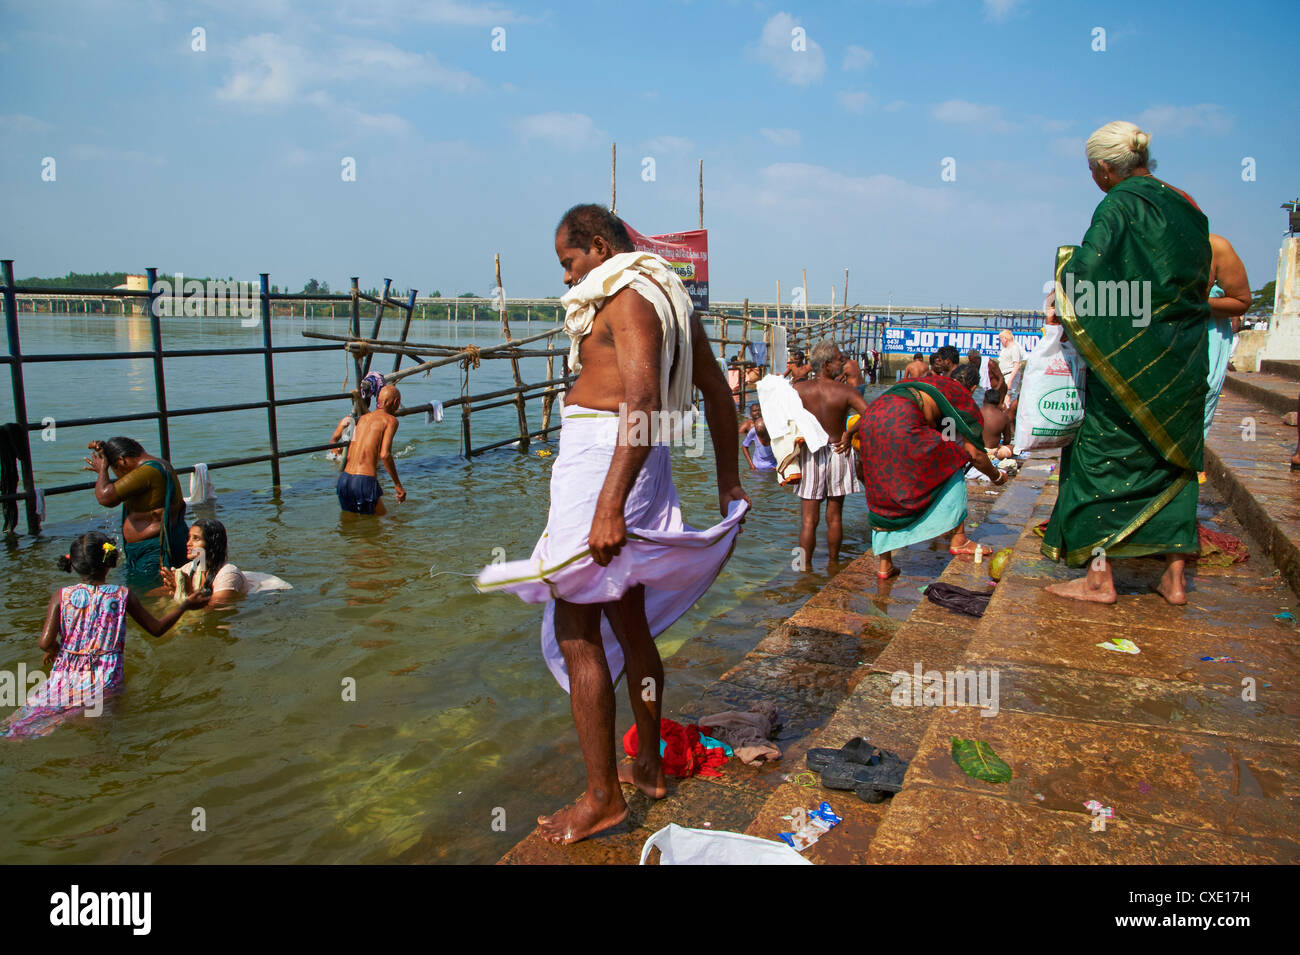 Ritual bathing, Sri Jambukeshwara temple, Tiruchirappalli (Trichy), Tamil Nadu, India, Asia - Stock Image